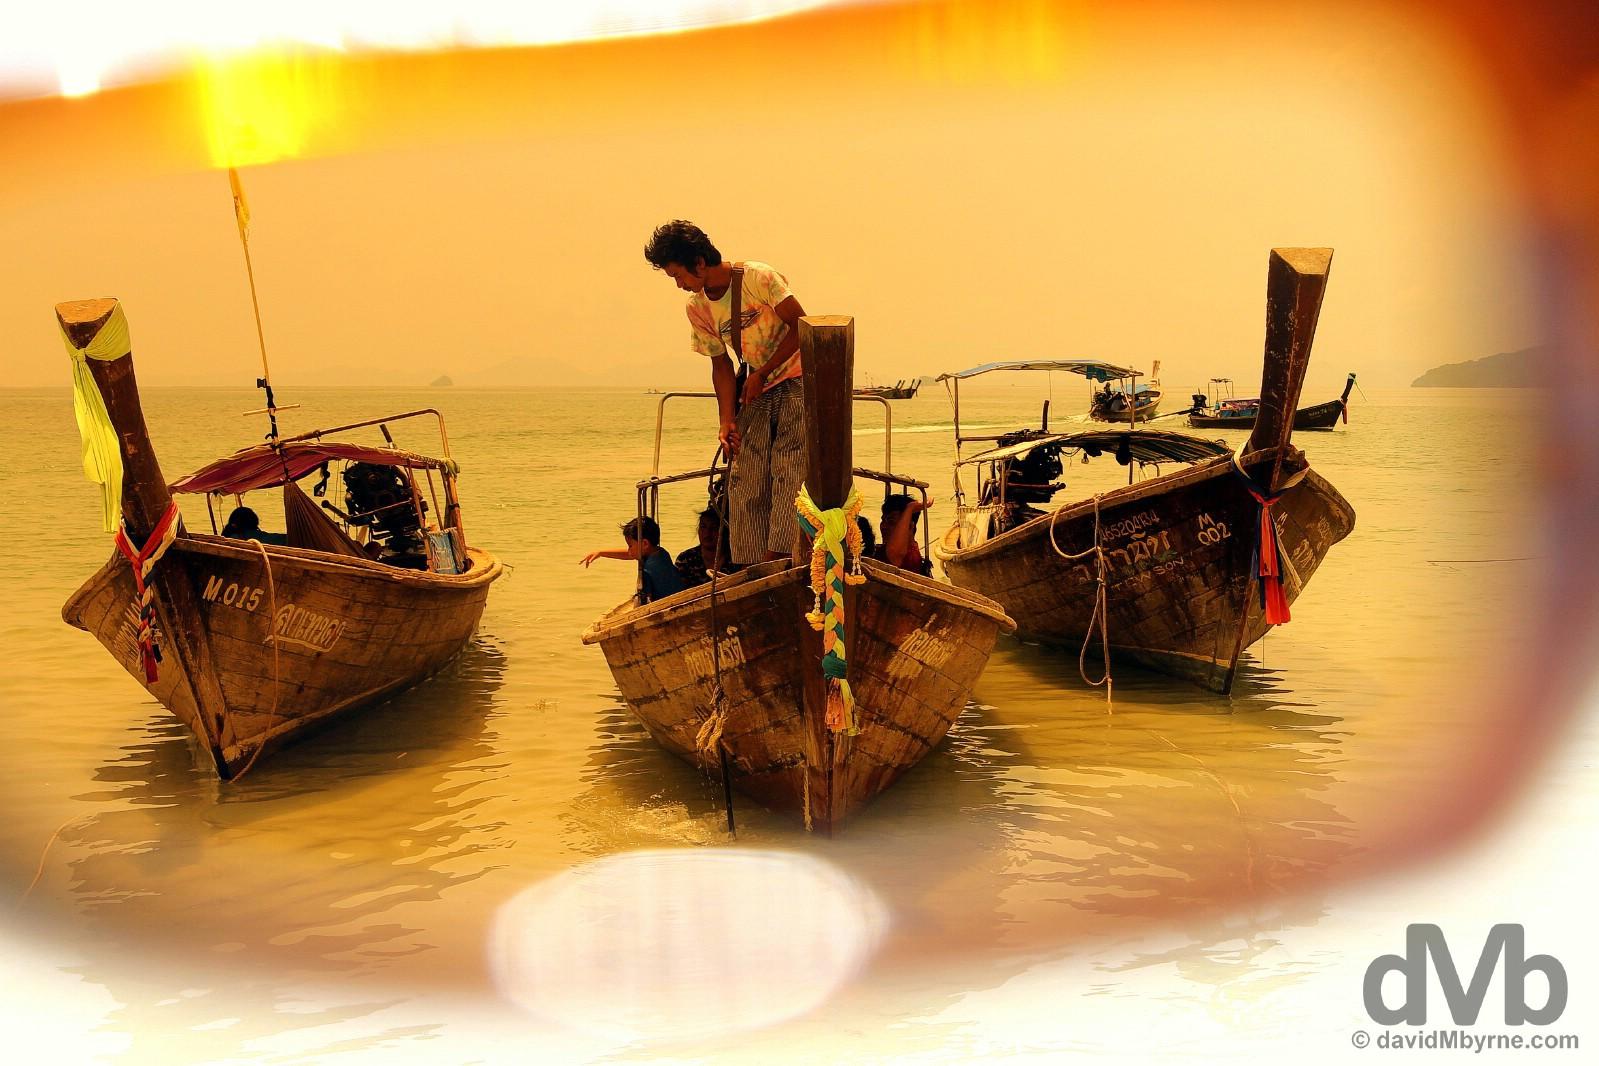 Arriving on Hat Rai Leh West Beach, Krabi, southern Thailand. March 17, 2012.